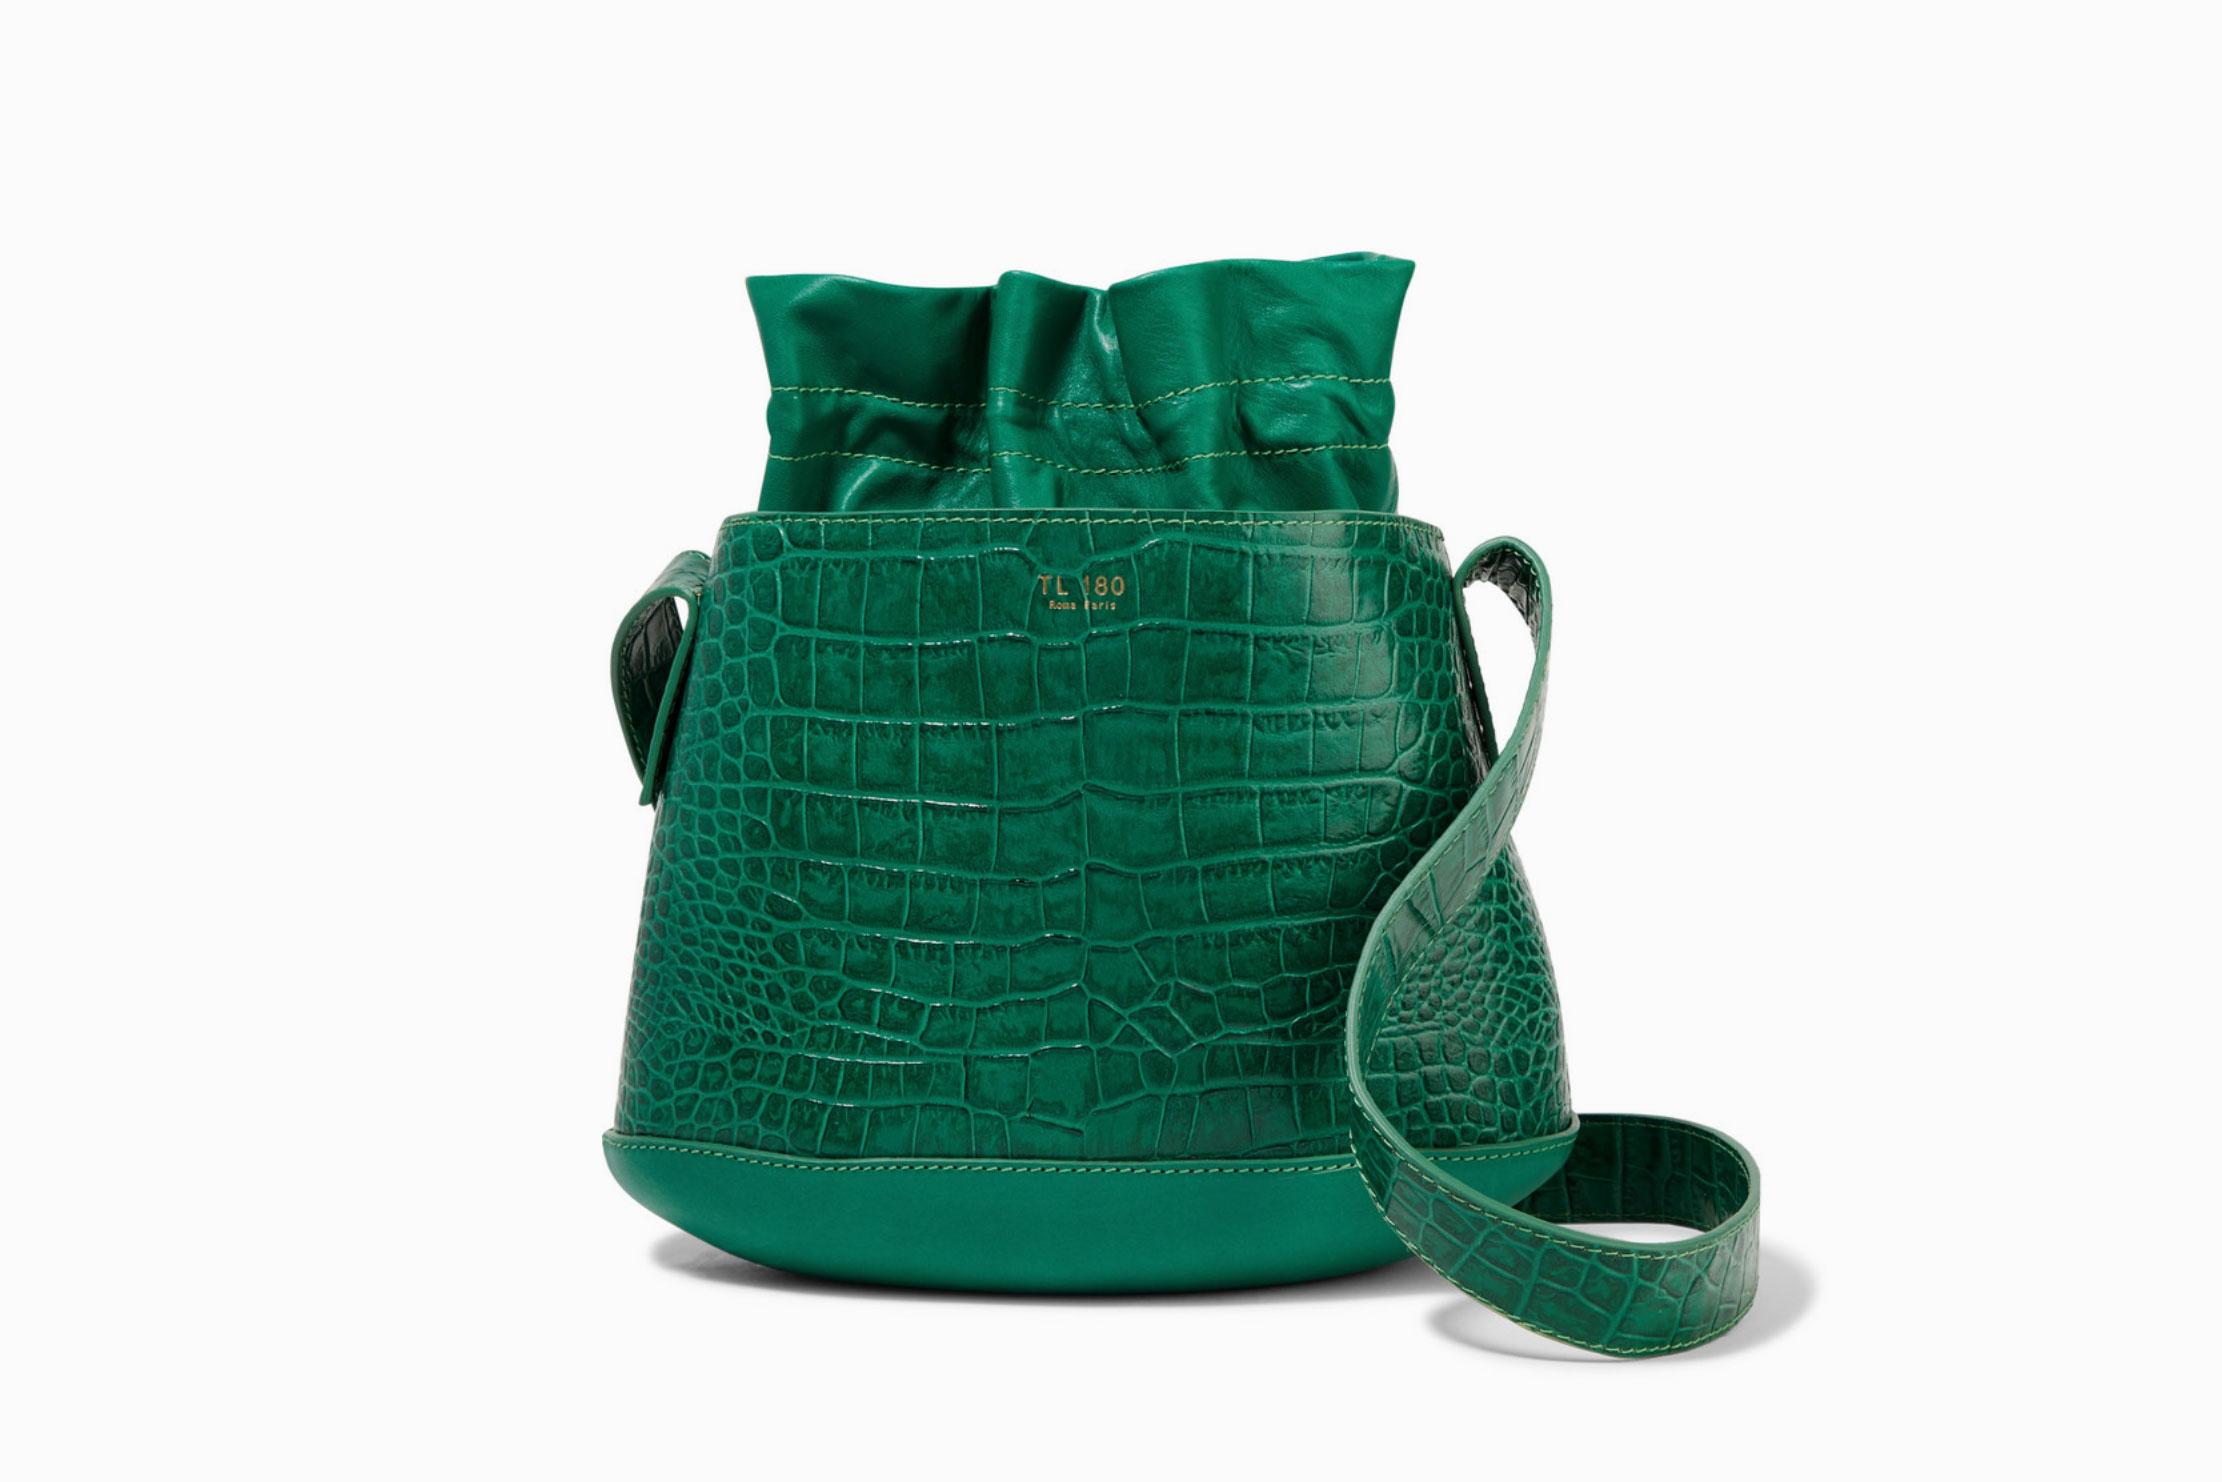 TL-180 La Marcello Leather Bucket Bag